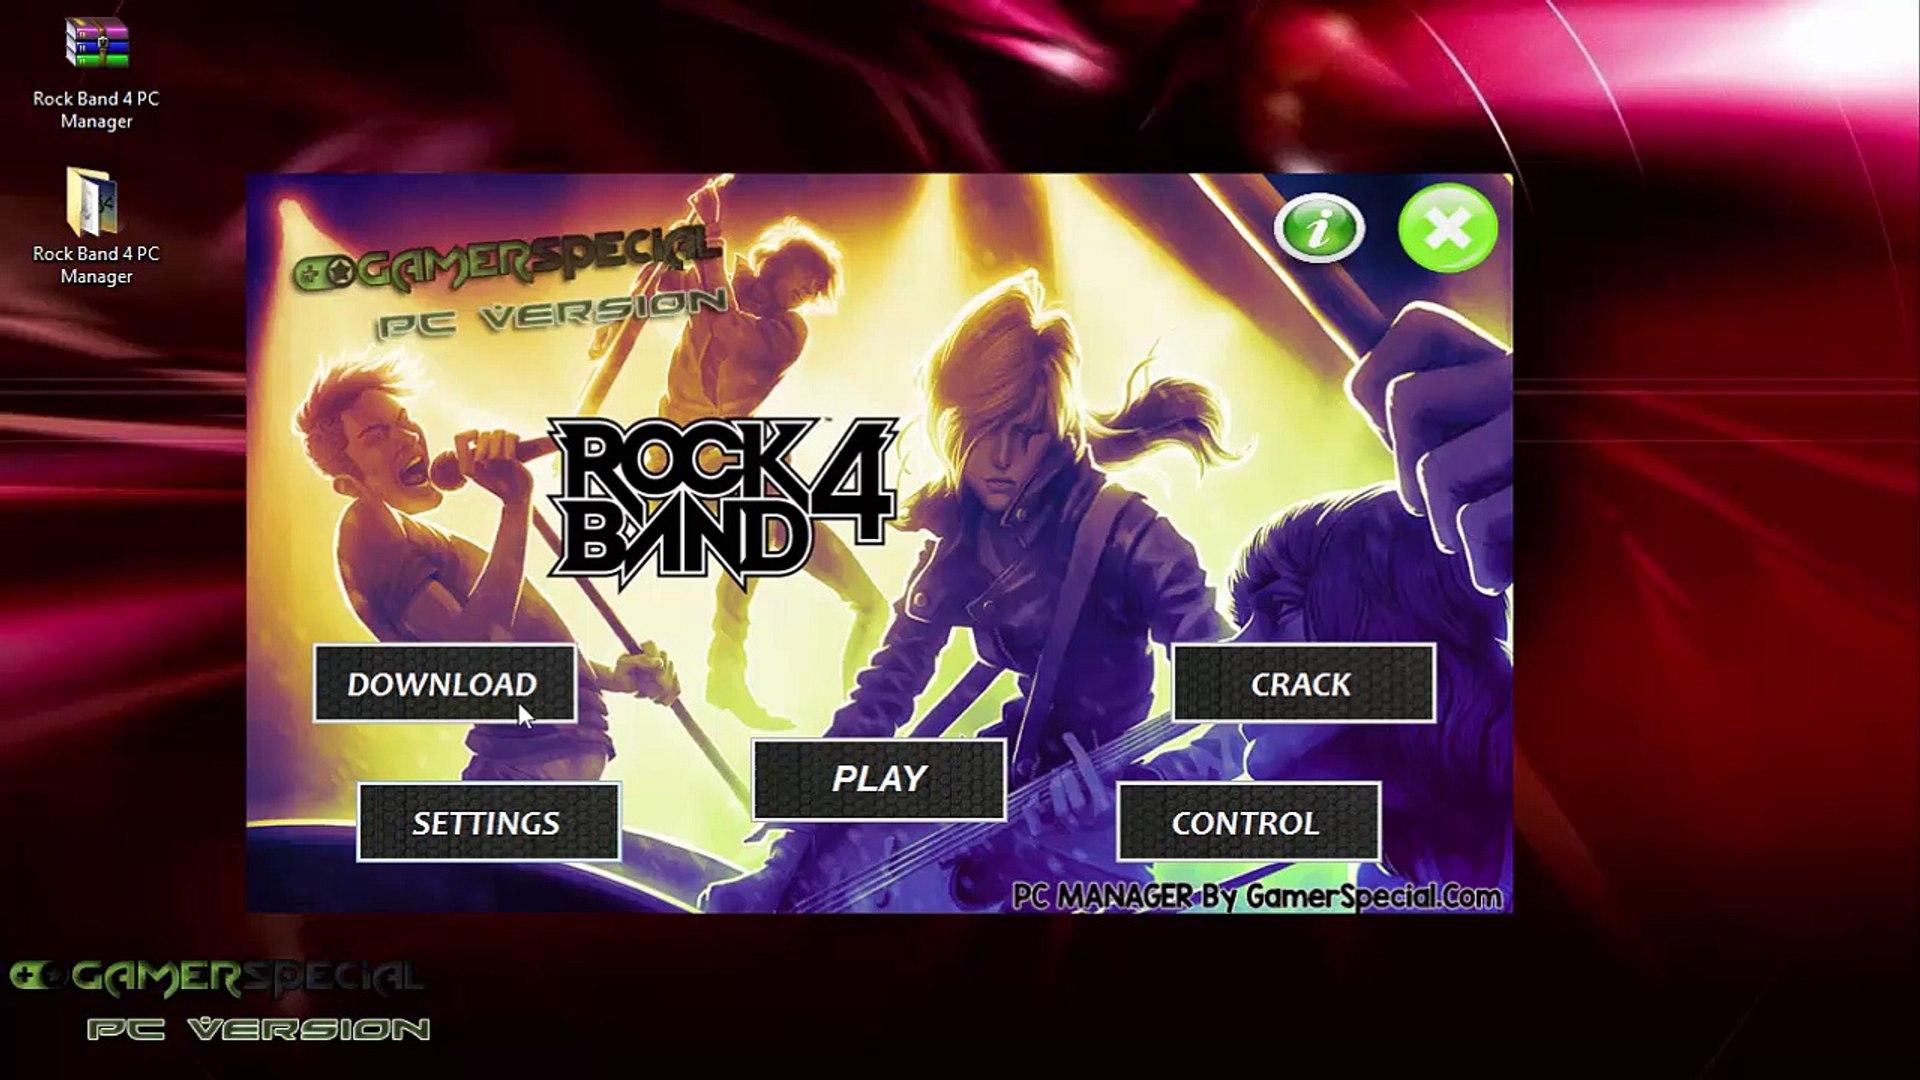 Rock Band 4 PC Version Download